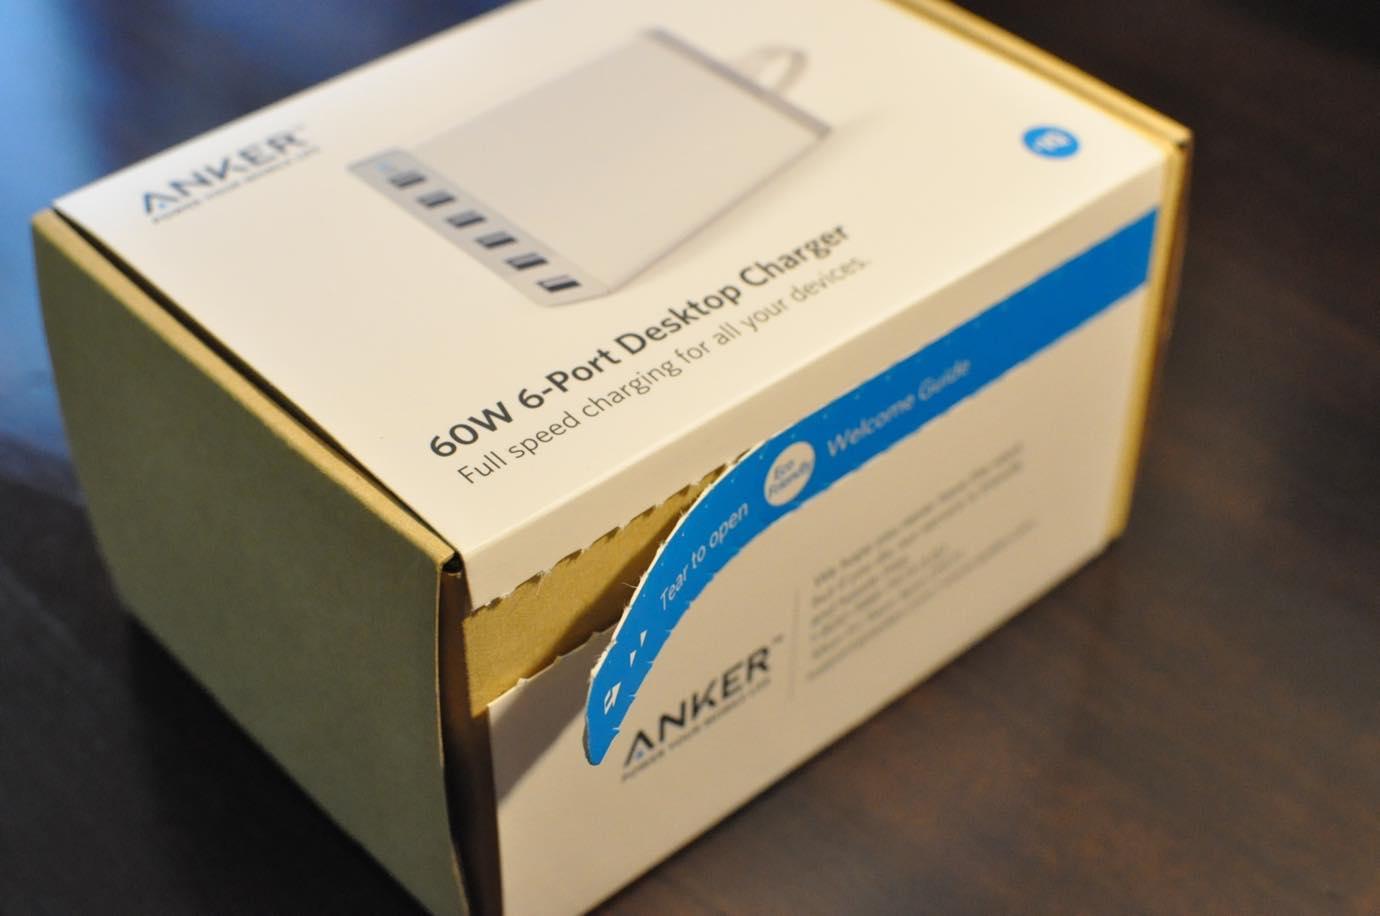 Anker 60W 6ポート USB急速充電器 09 20150808 135911